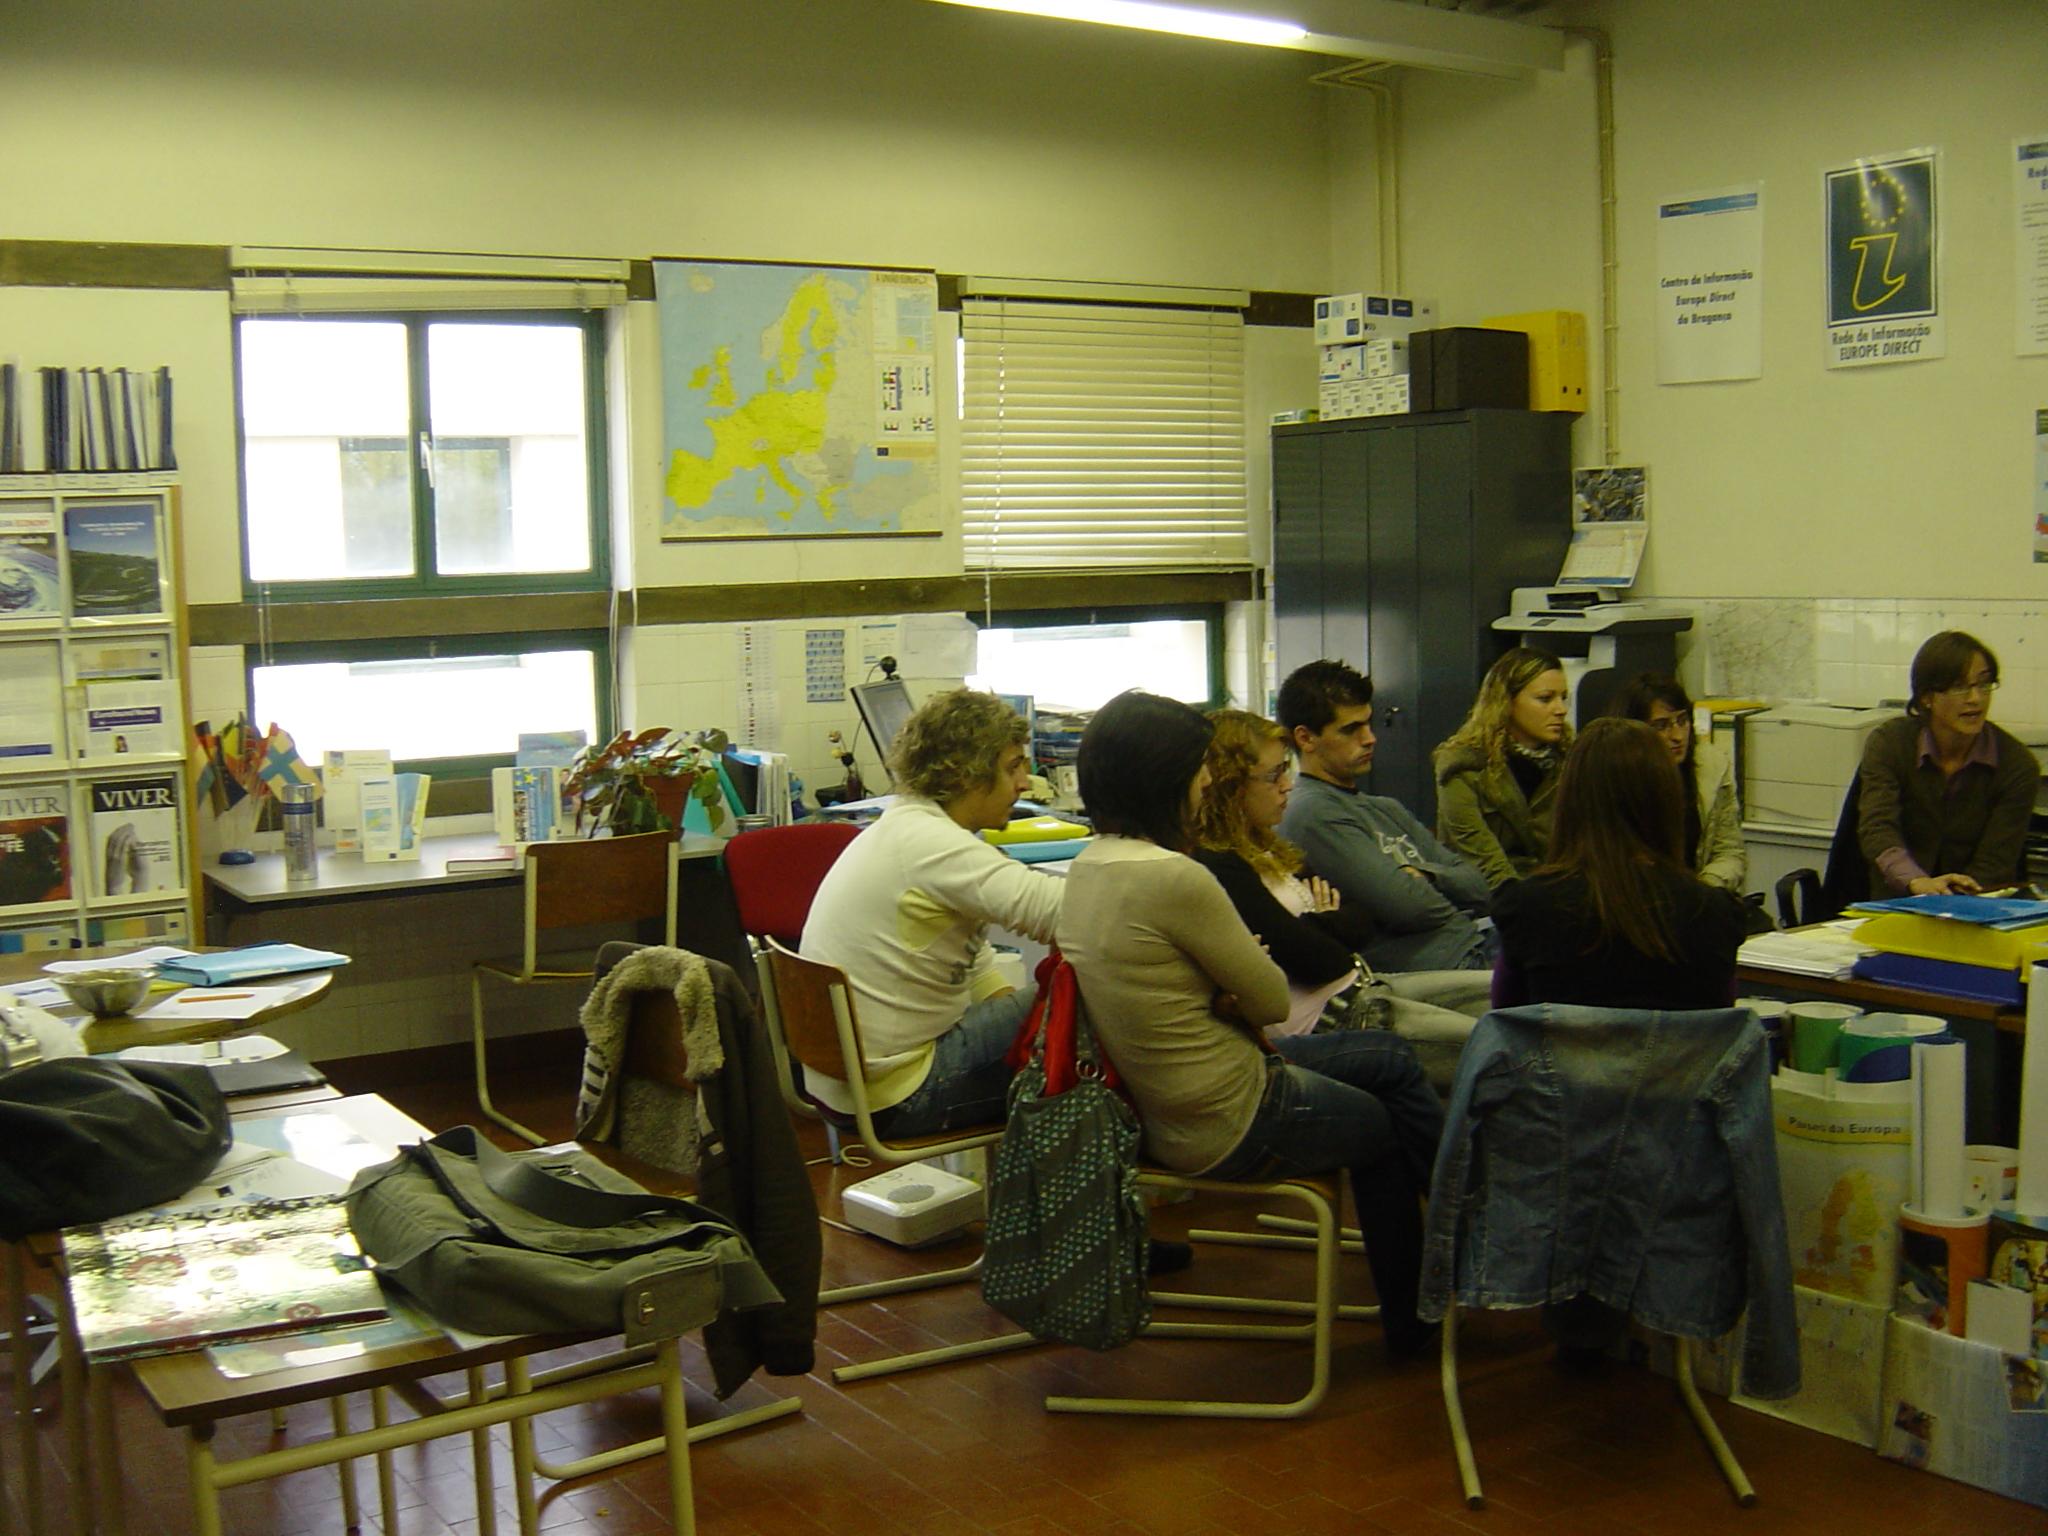 Visita de Estudo do CET de Cuidados Veterinários